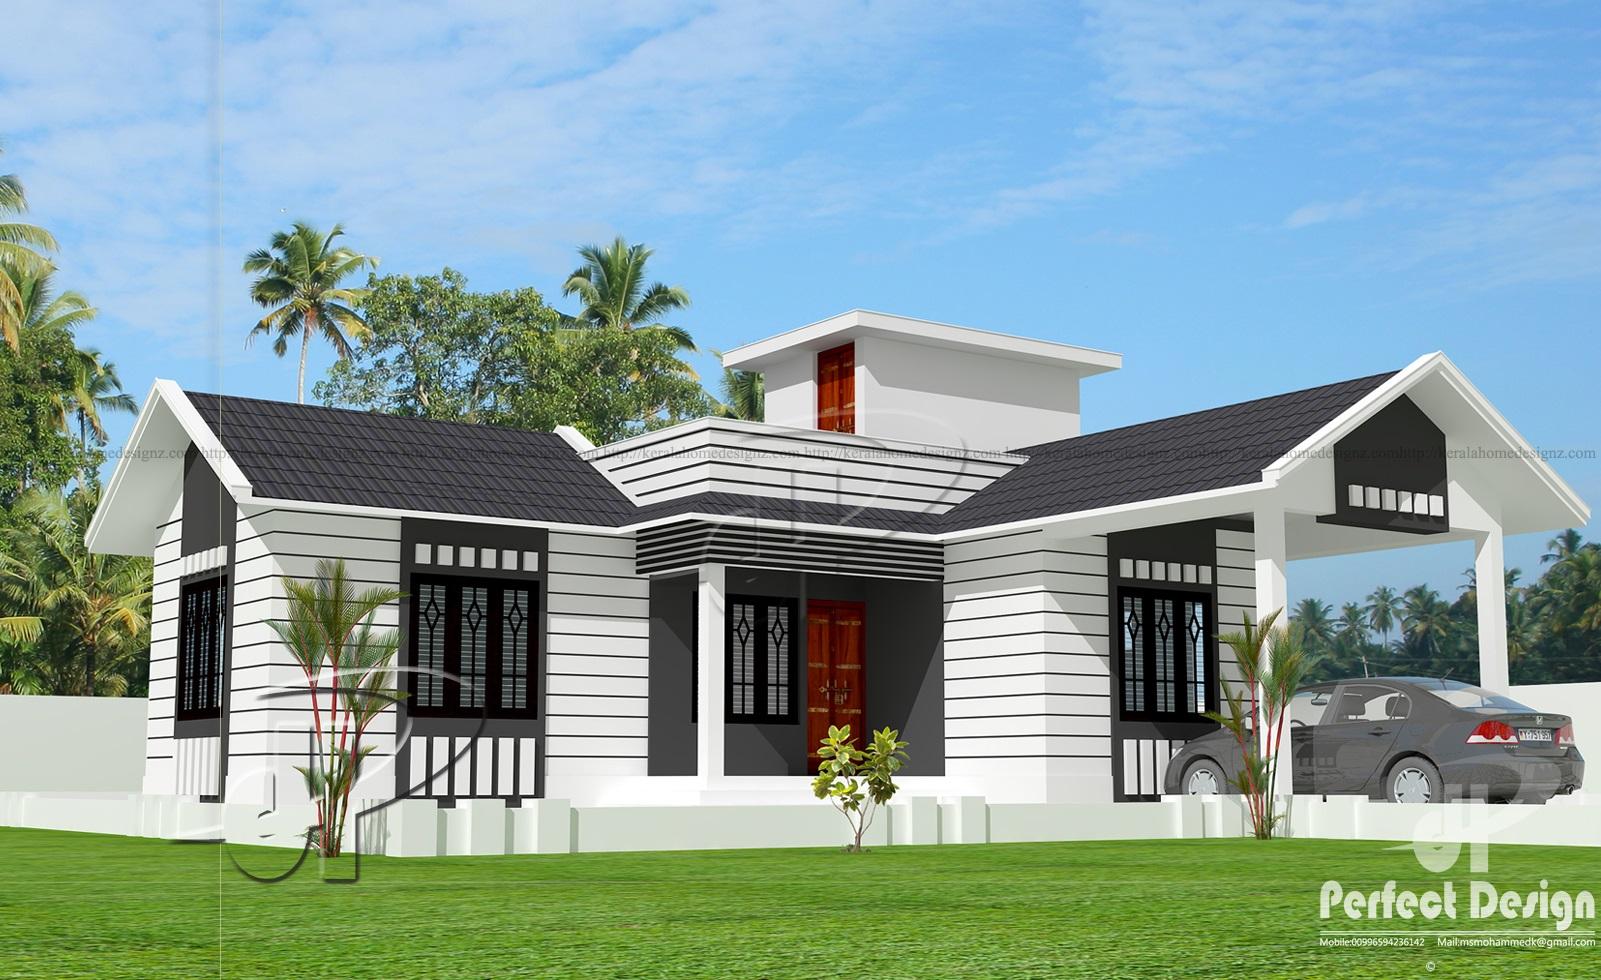 850 Sq Ft Single Floor Home